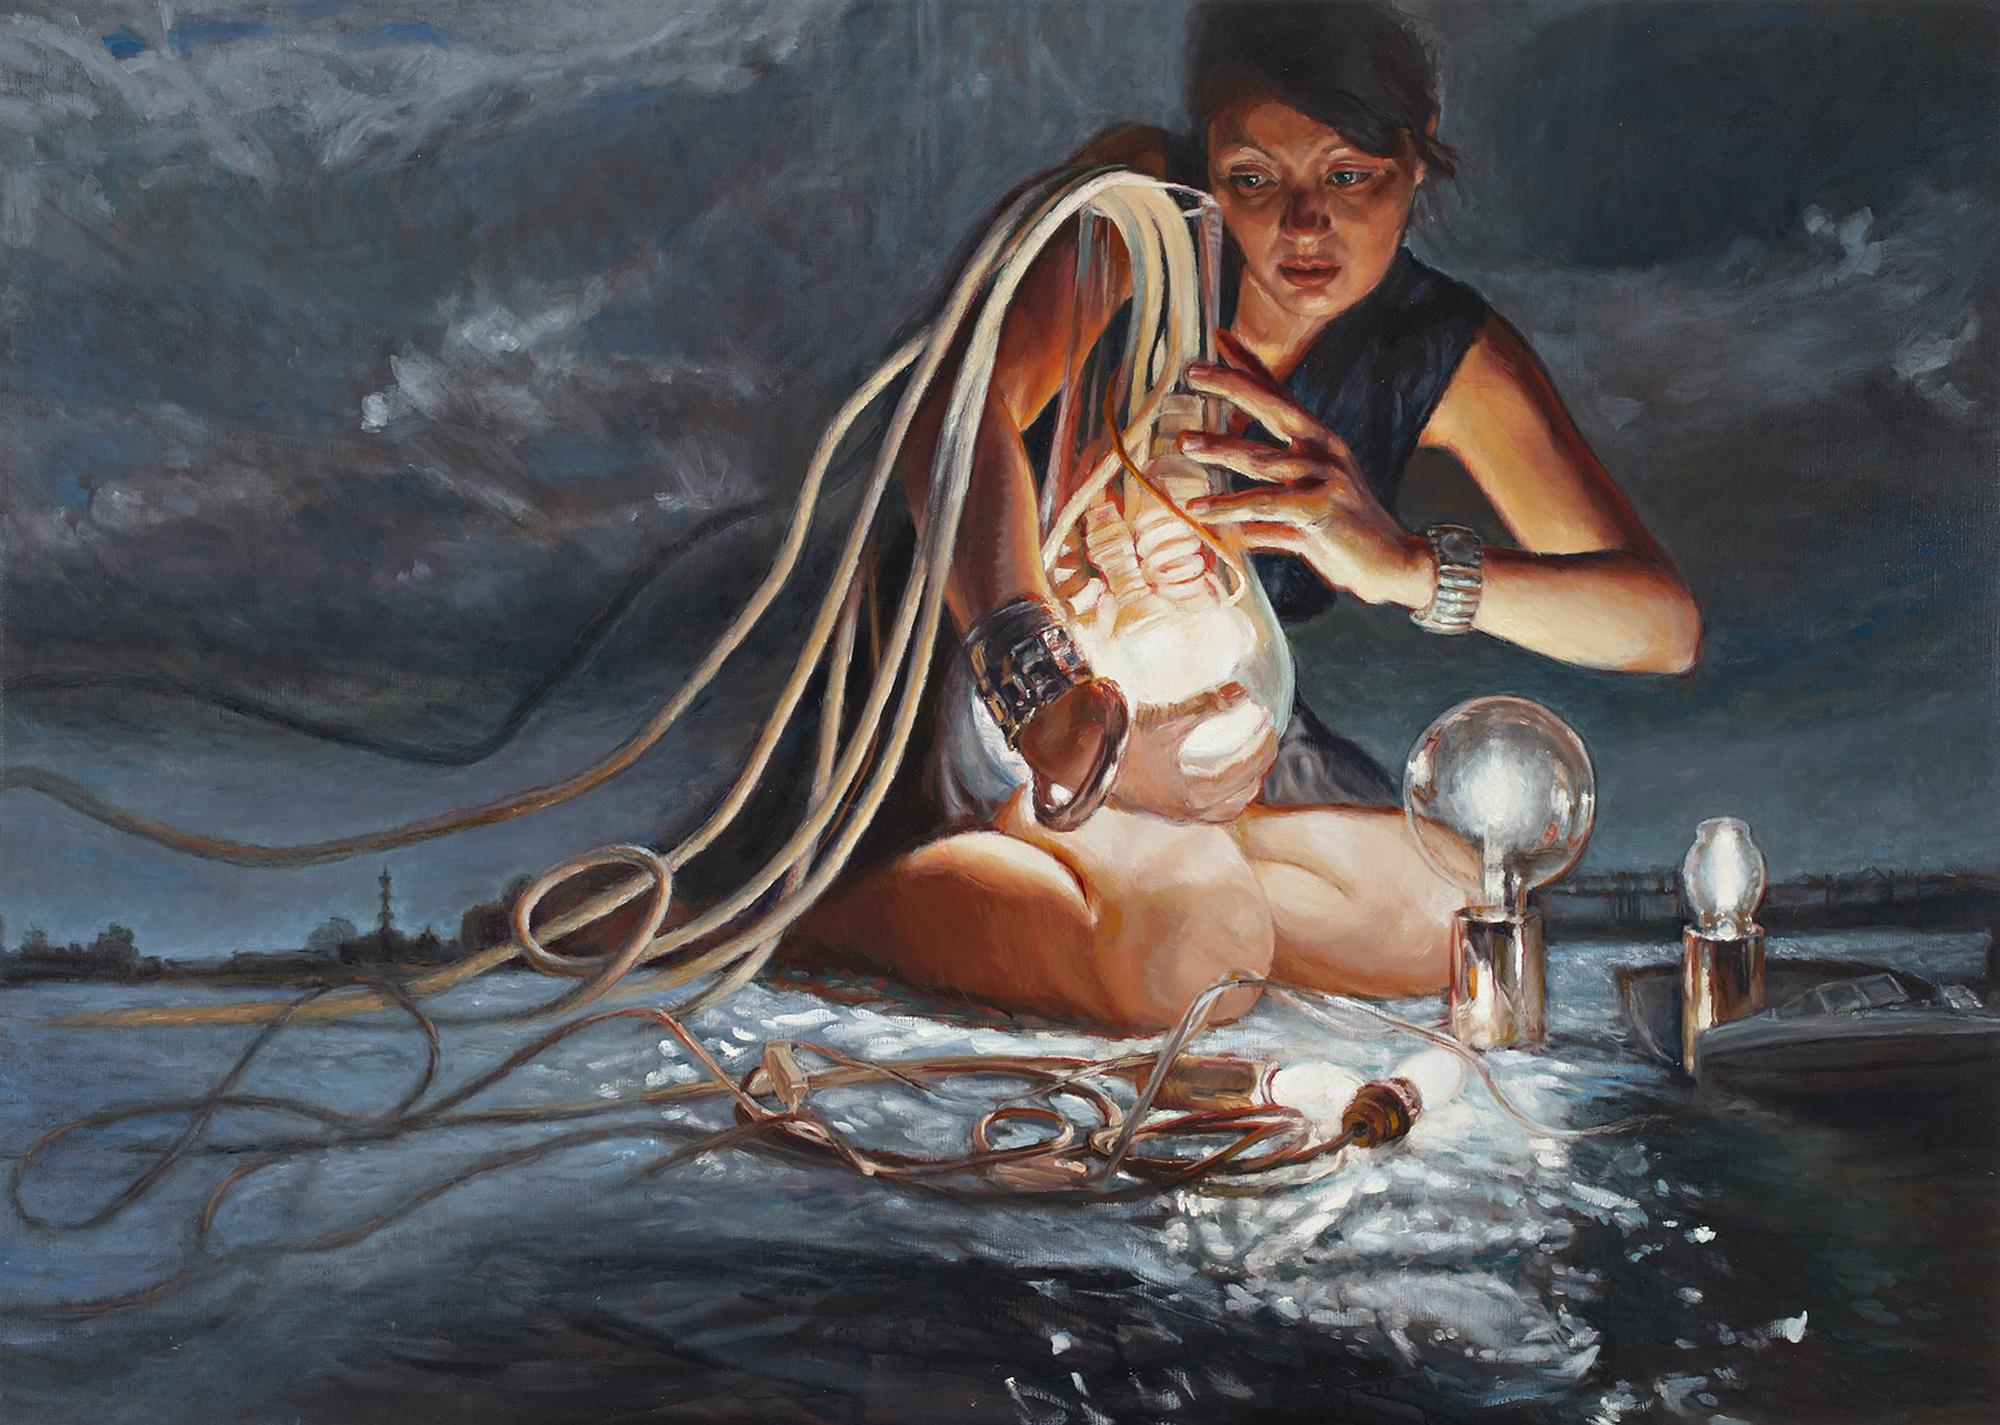 'Beacon' 160x225 cm, oil on linen